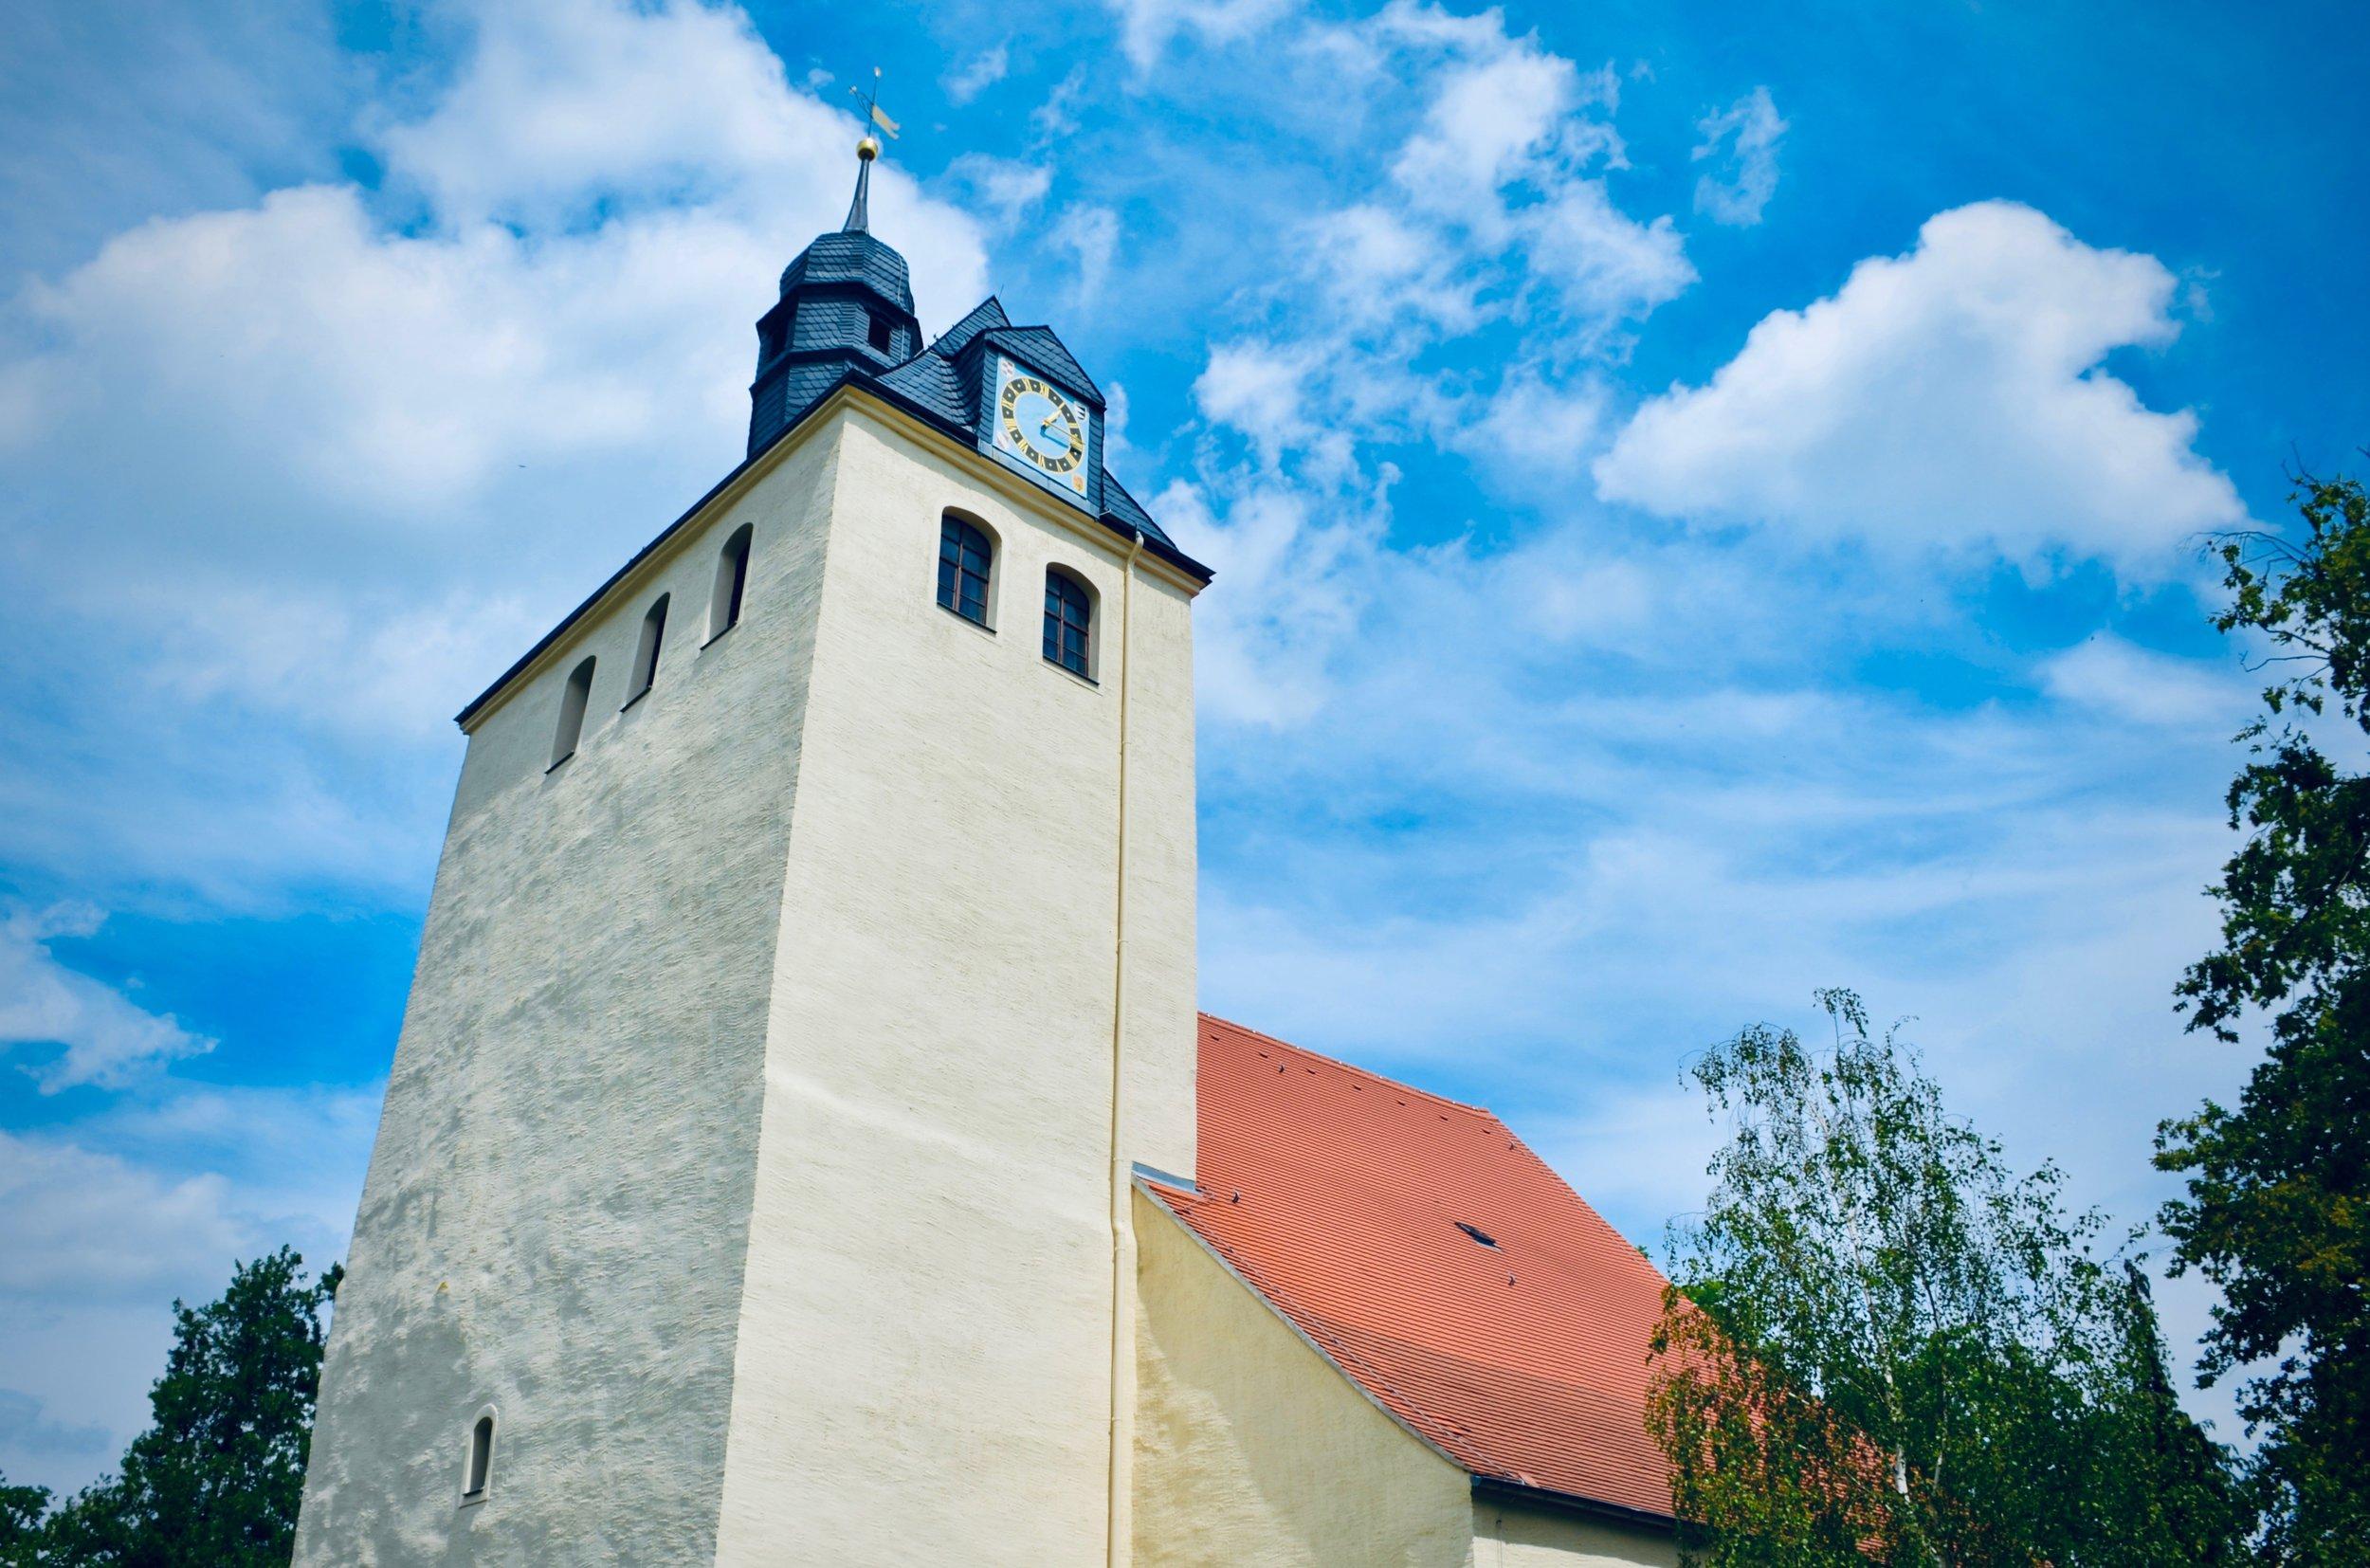 The Wehrkirche in Pomßen, Germany.